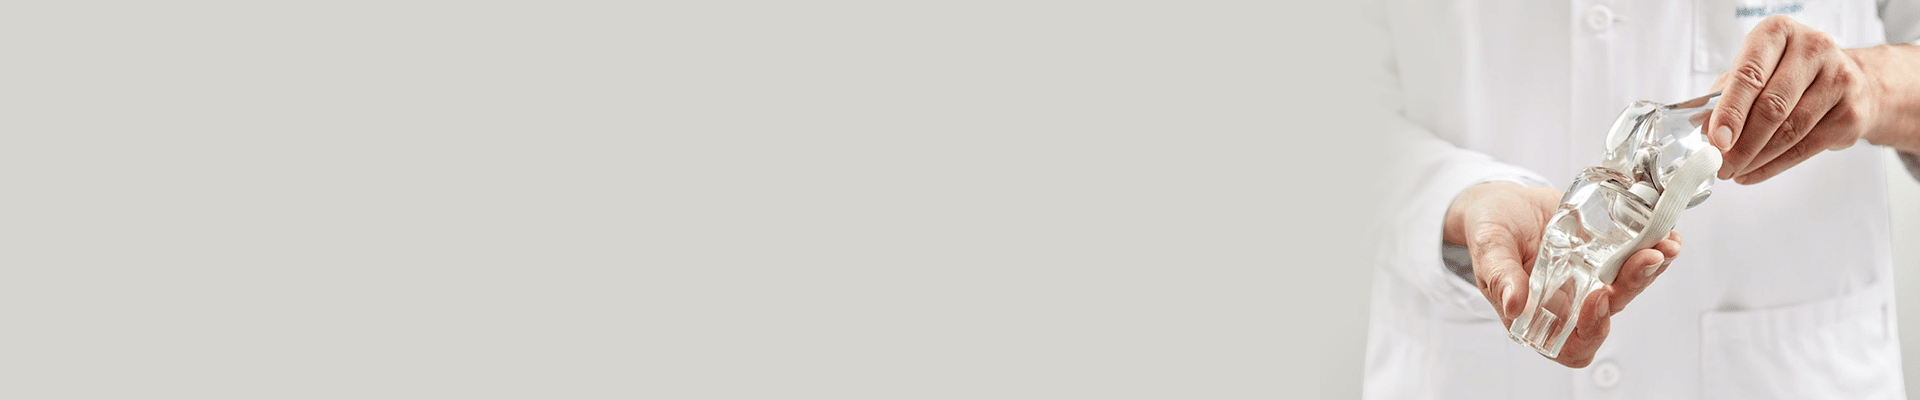 [:fr]Chirurgie orthopédique à Nabeul[:ar]جراحة العظام في نابل[:]